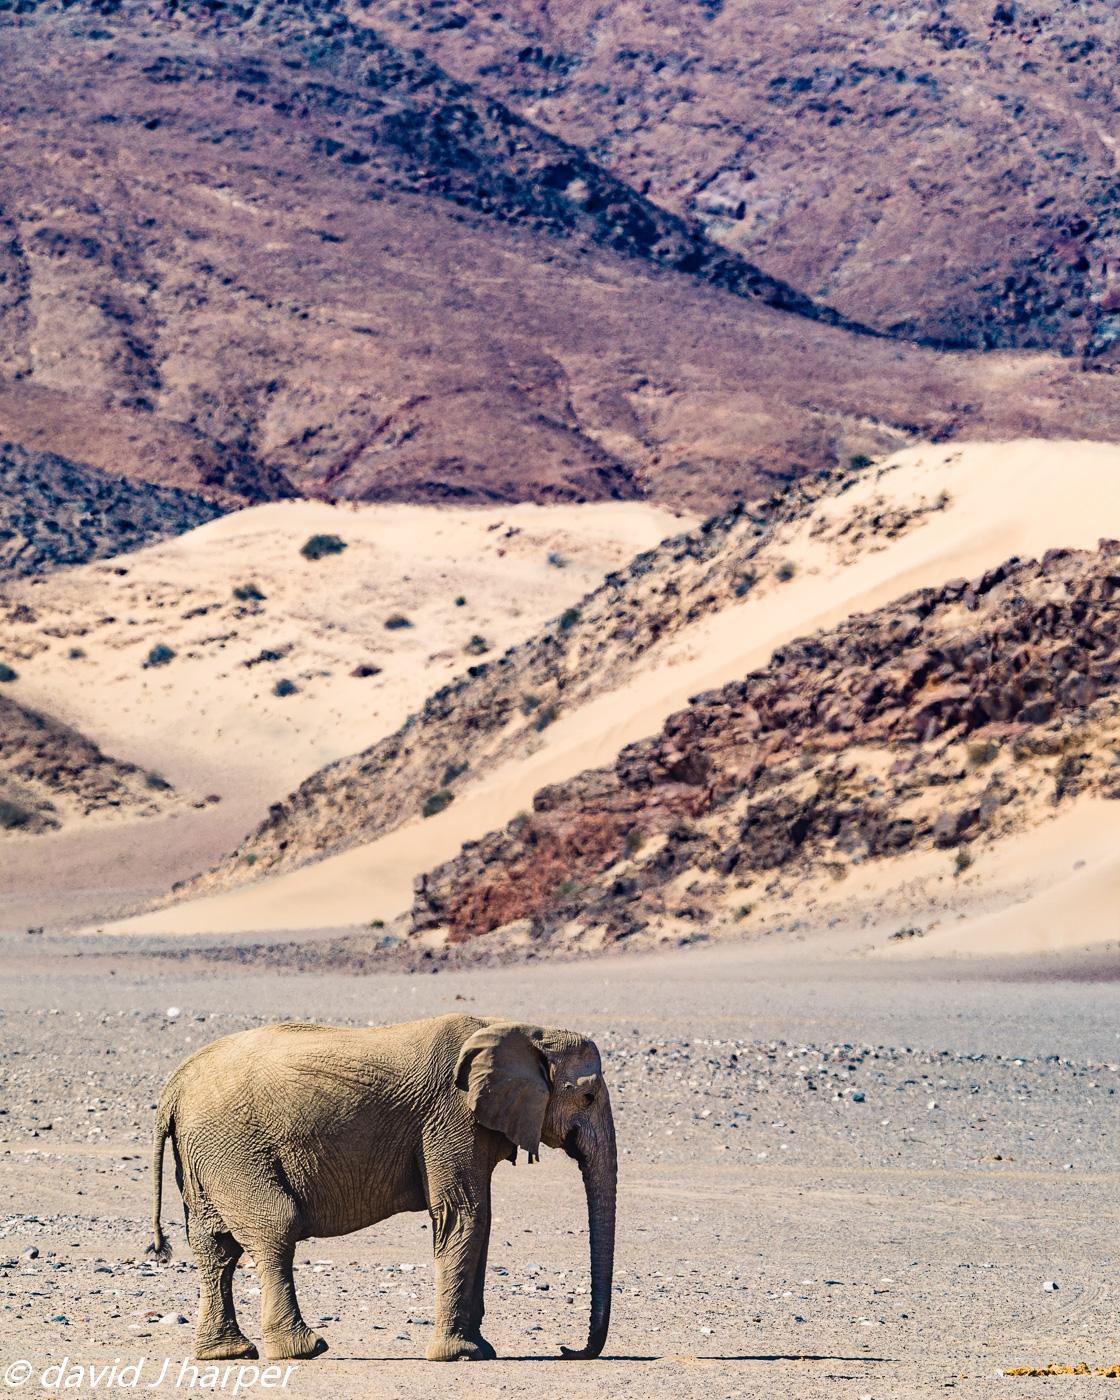 DJH-Namibia-20171019-0P0A8967